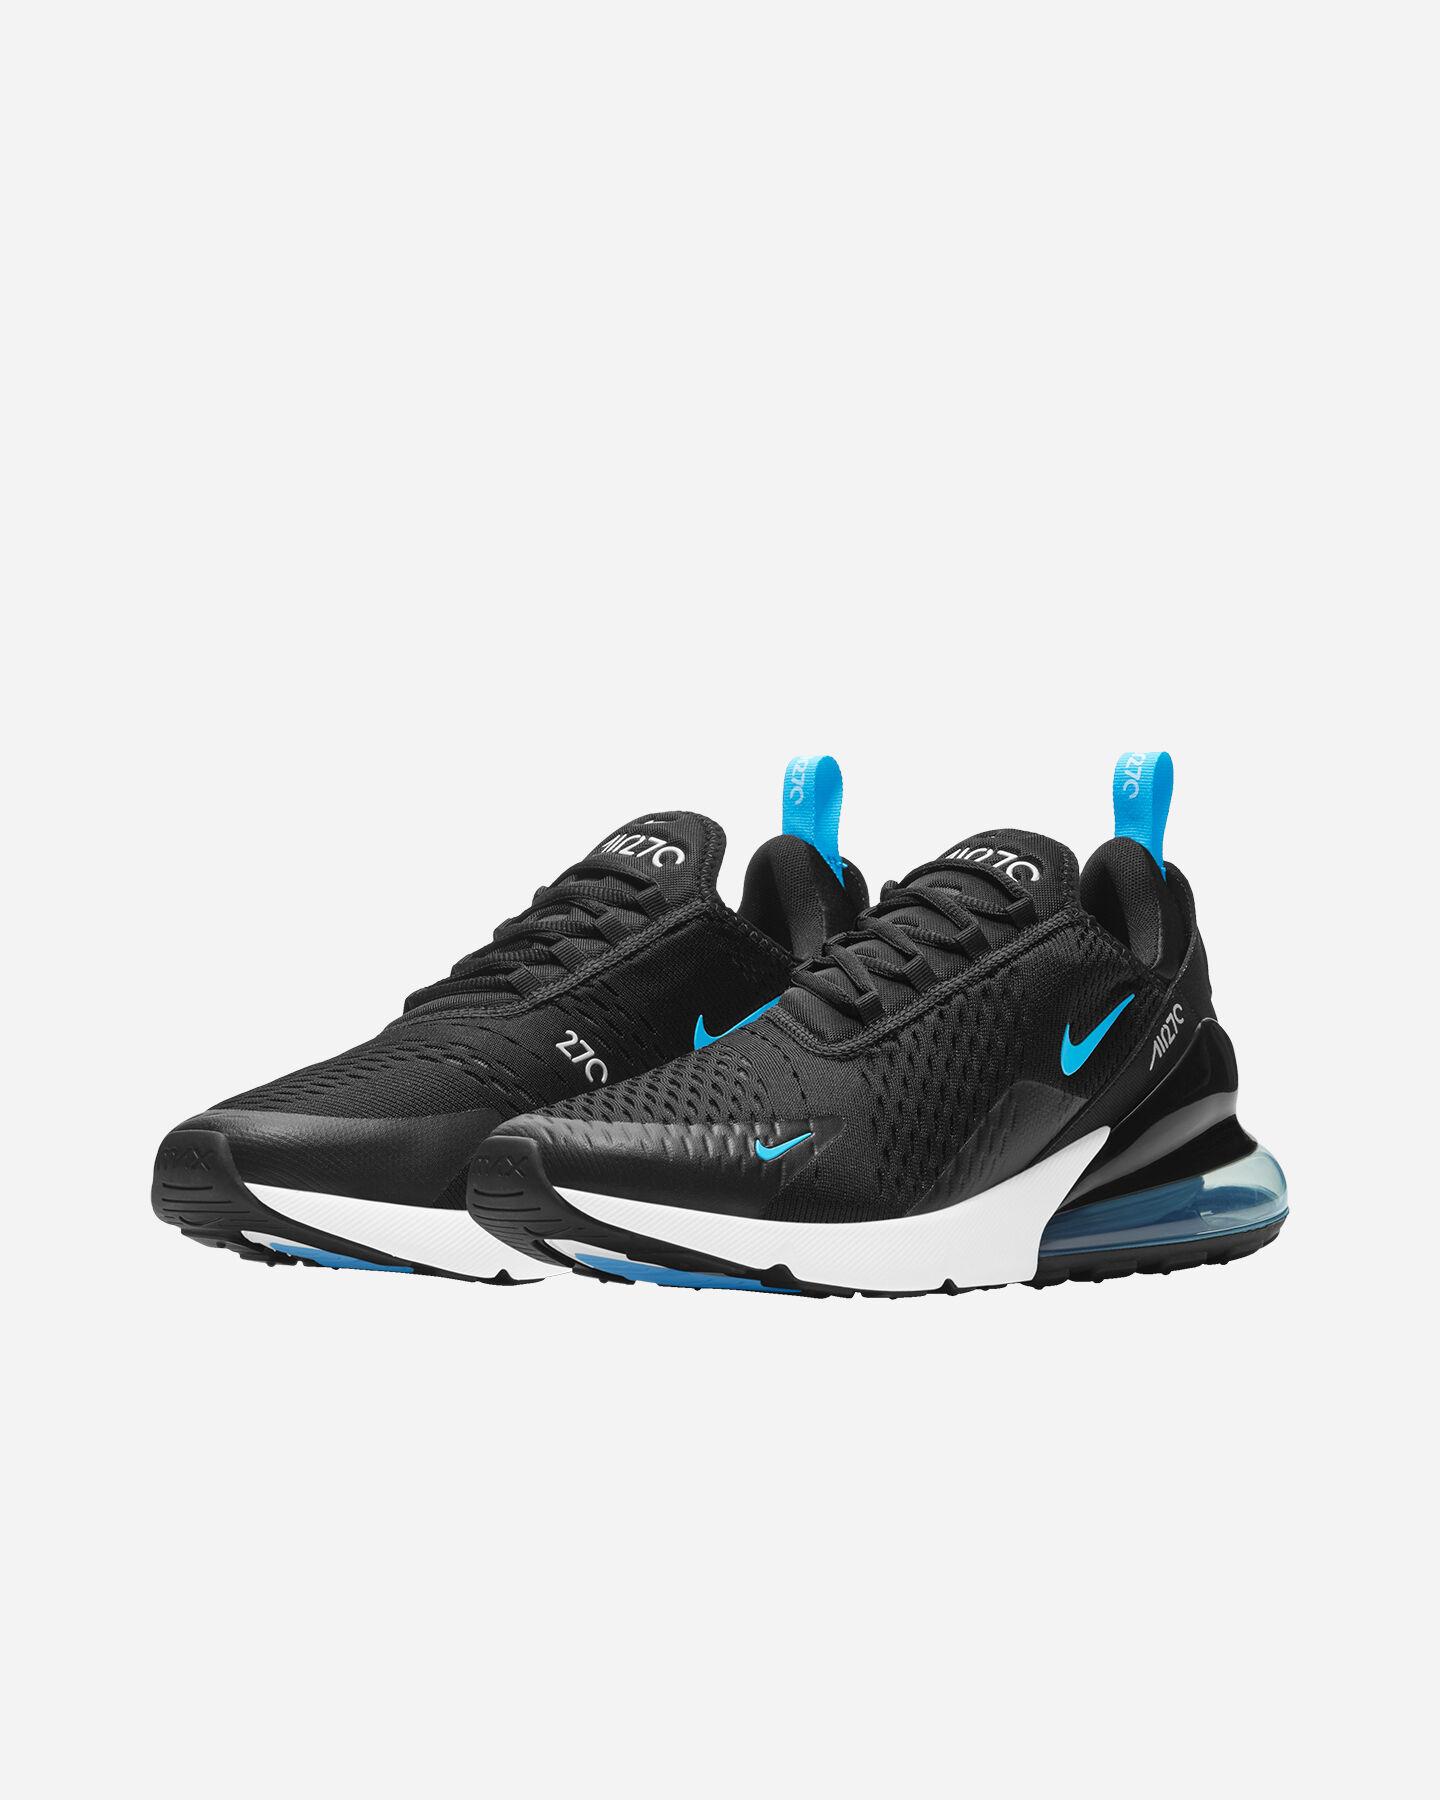 Scarpe sneakers NIKE AIR MAX 270 M S5270591 scatto 1